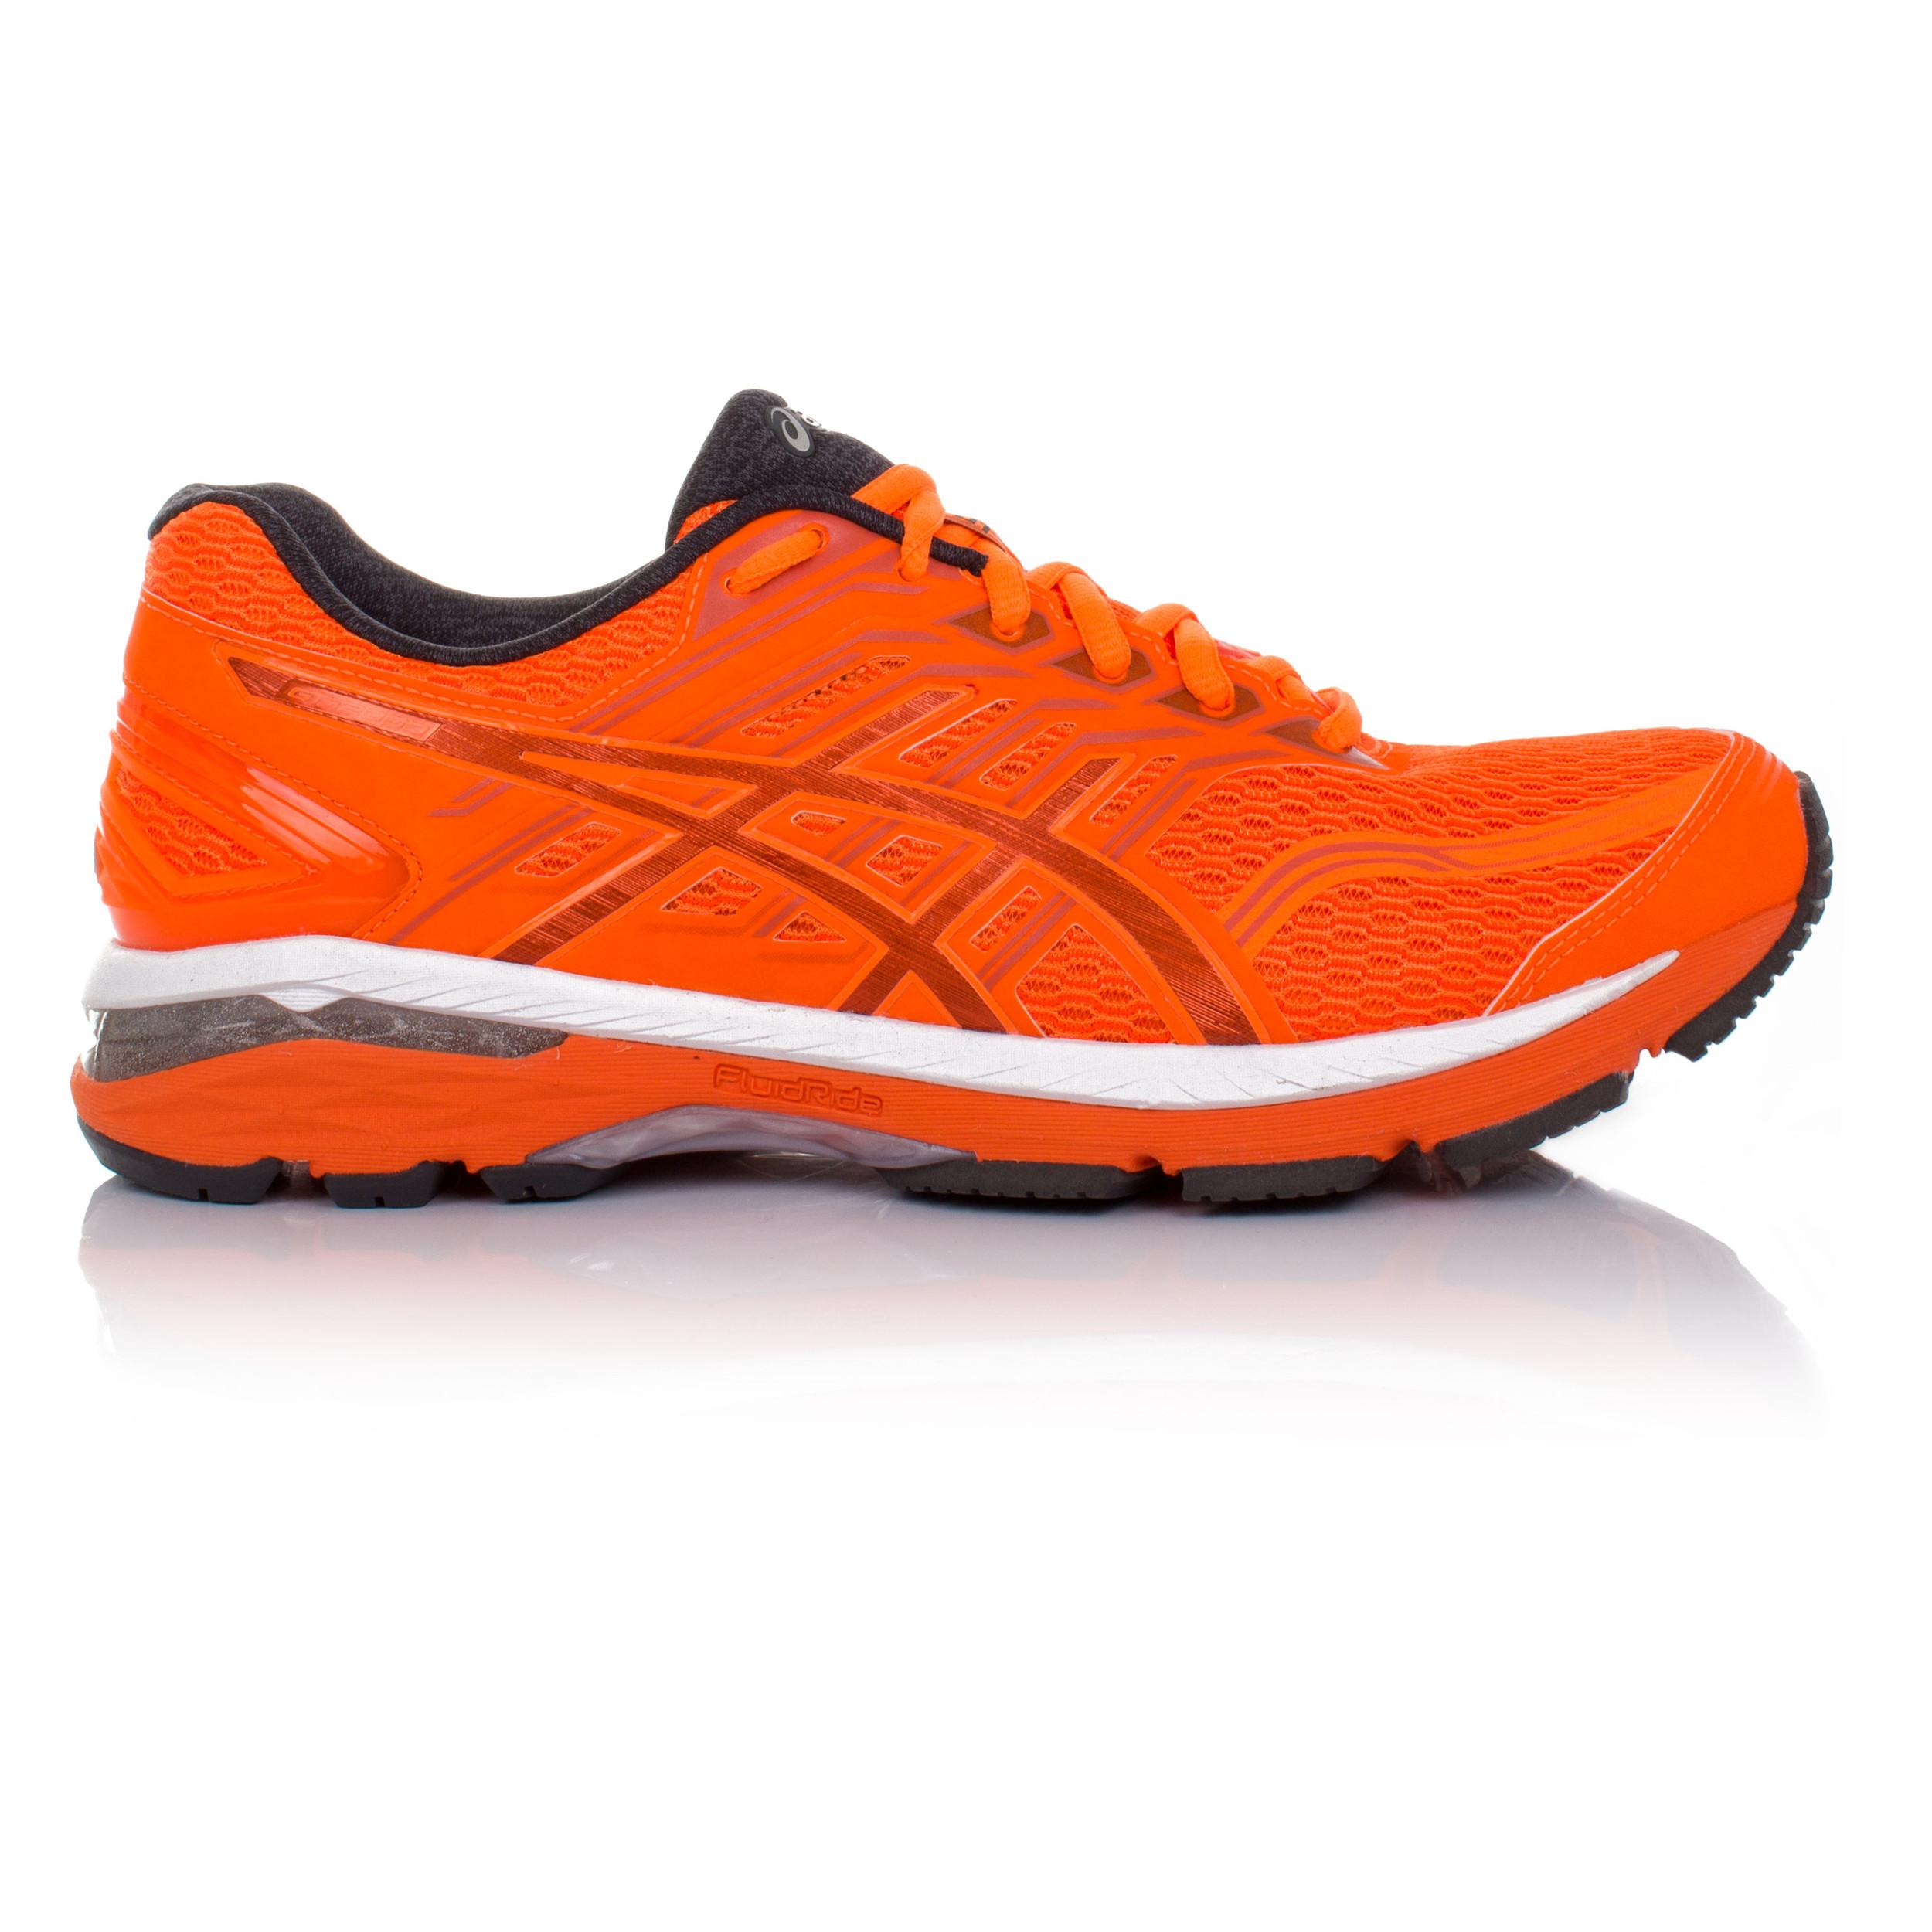 Asics Gt 2000 5 Summer Pack Mens Orange Support Running